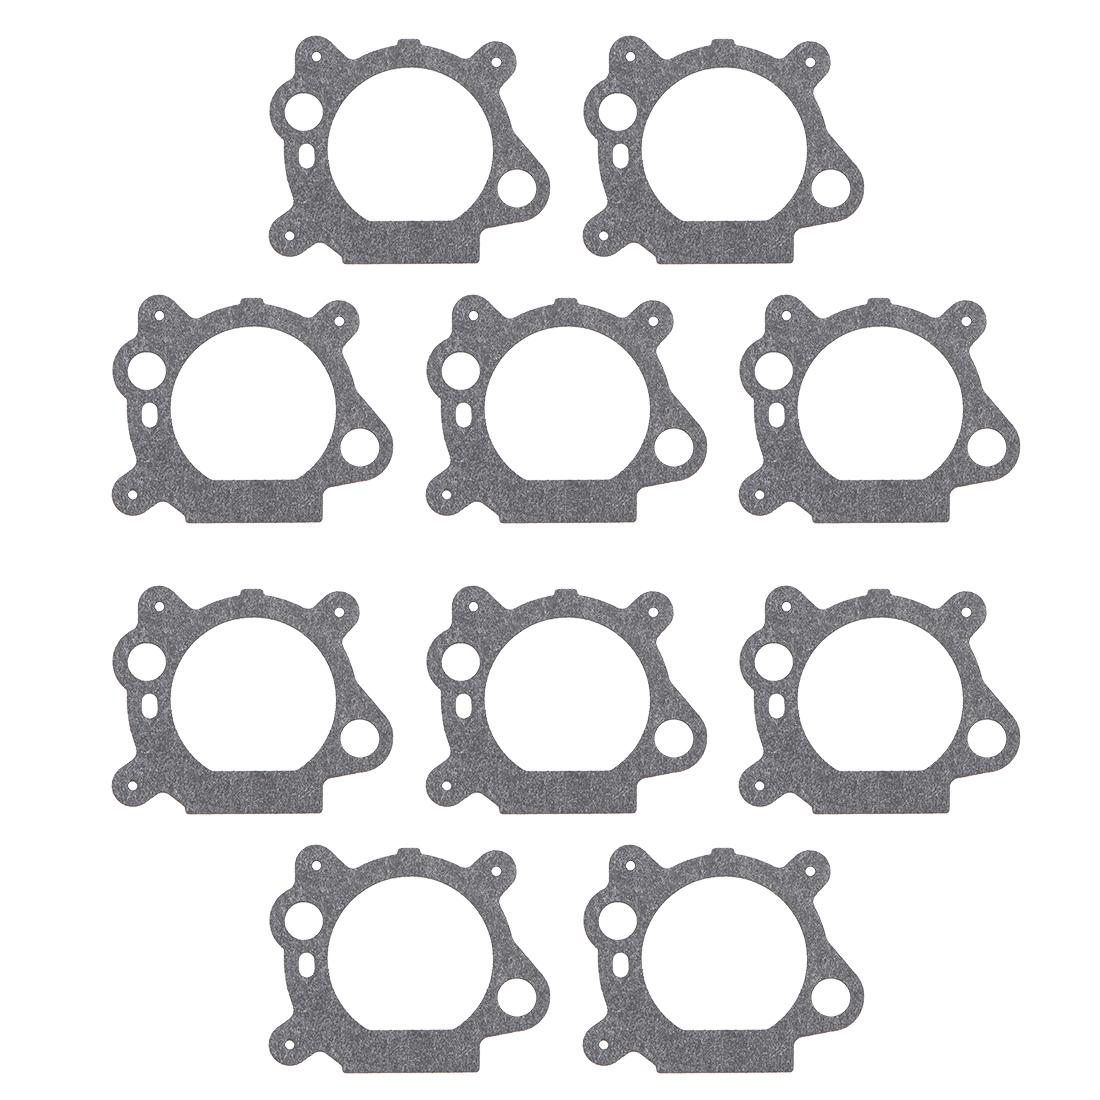 795629 Carburetor Rebuild Kit Gasket for Briggs Stratton 272653 272653S 10pcs